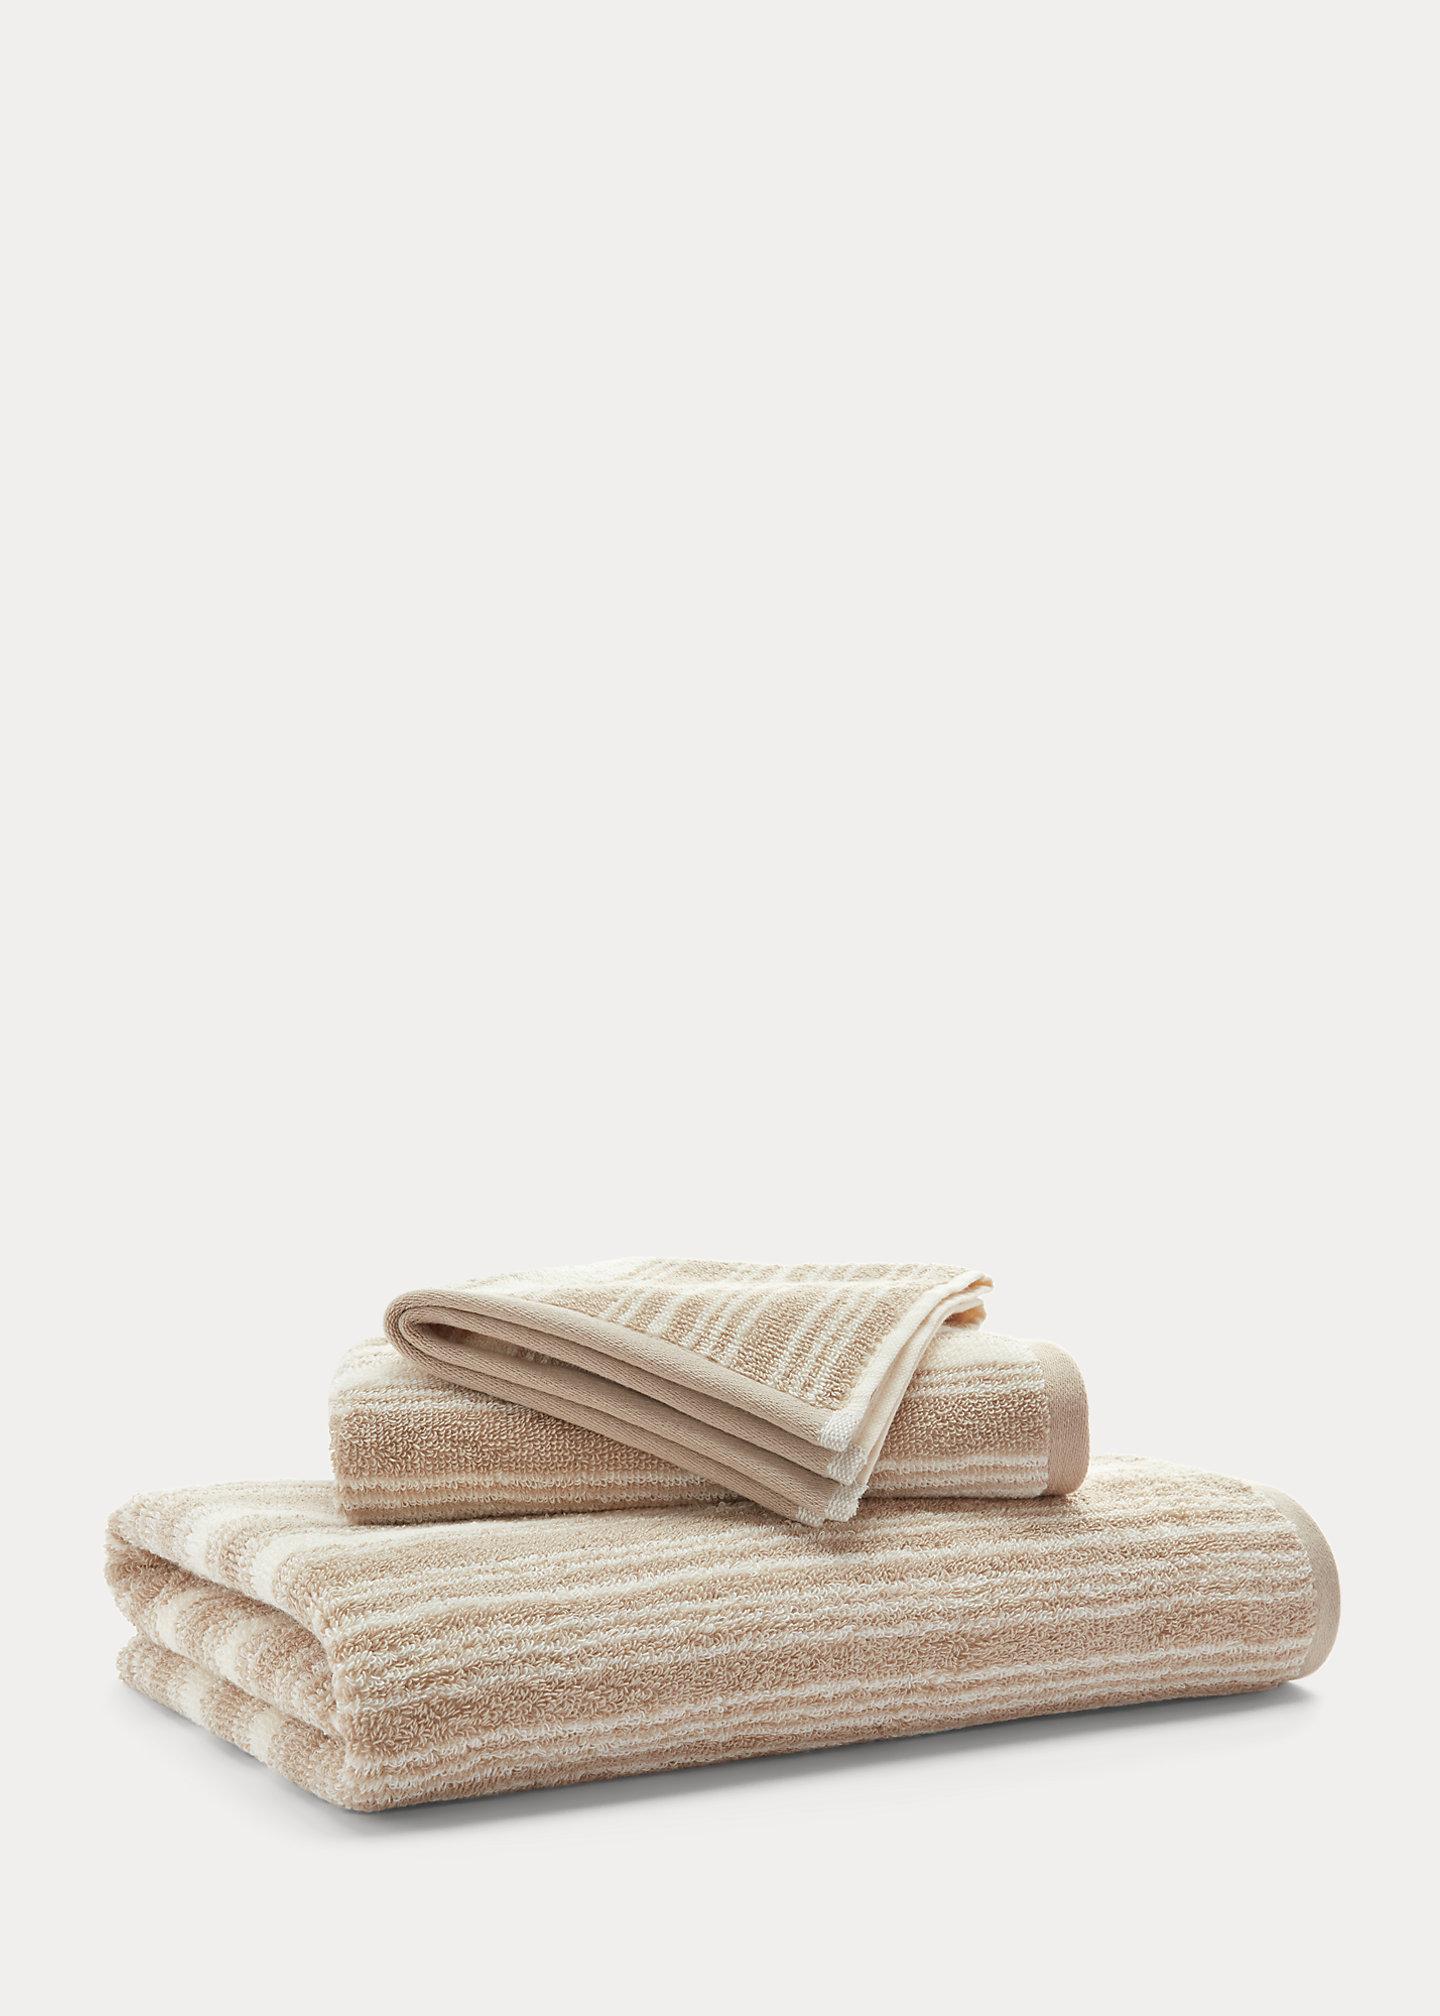 Lauren Home Sanders Striped Bath Towels